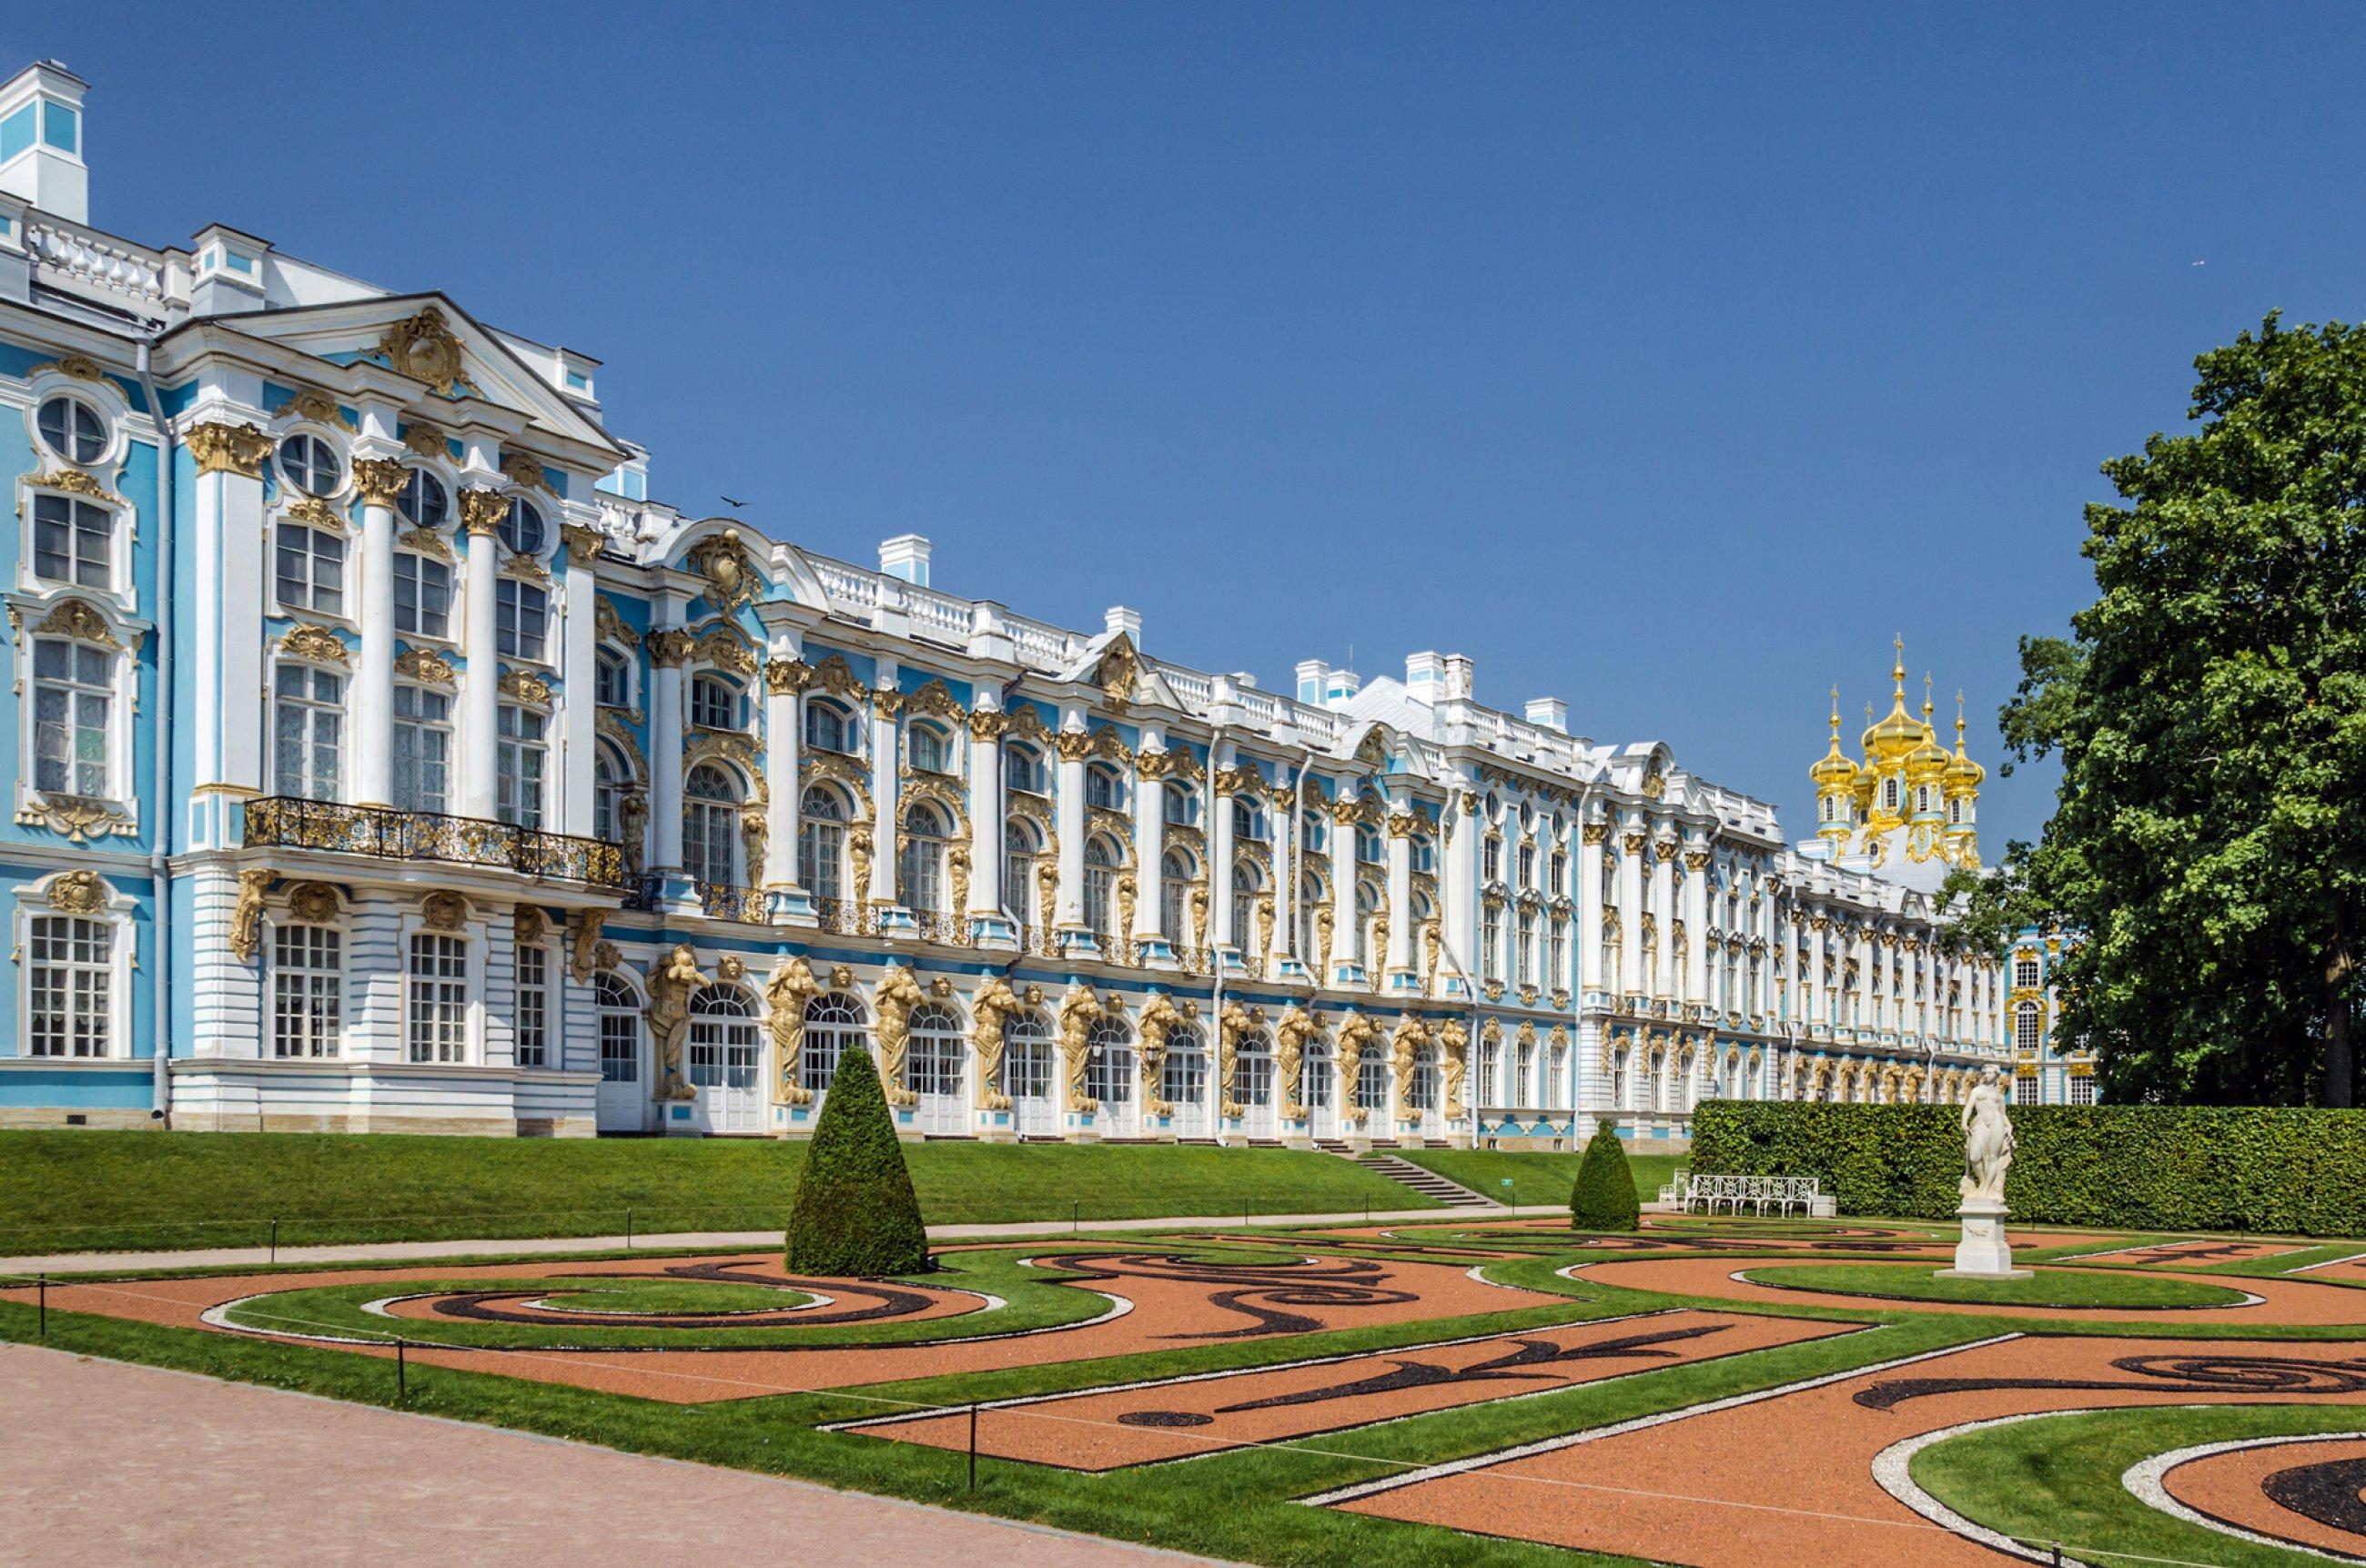 https://bubo.sk/uploads/galleries/5055/wikipedia-catherine-palace-in-tsarskoe-selo.jpg